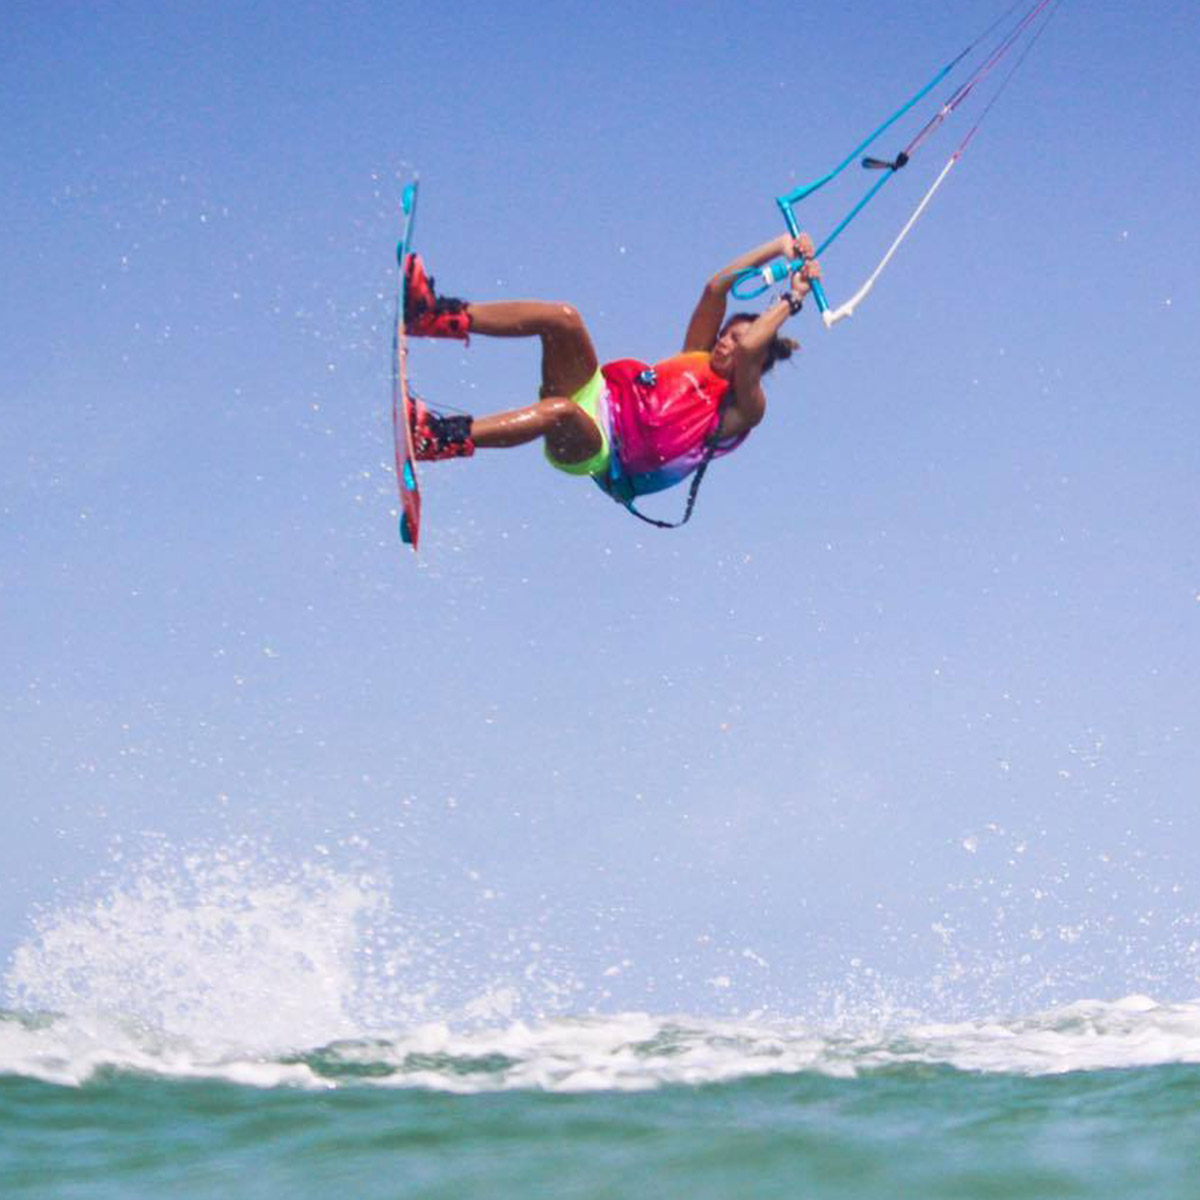 liloo-gringa-weridelocal-malavita-team-rider-kitesurf-7